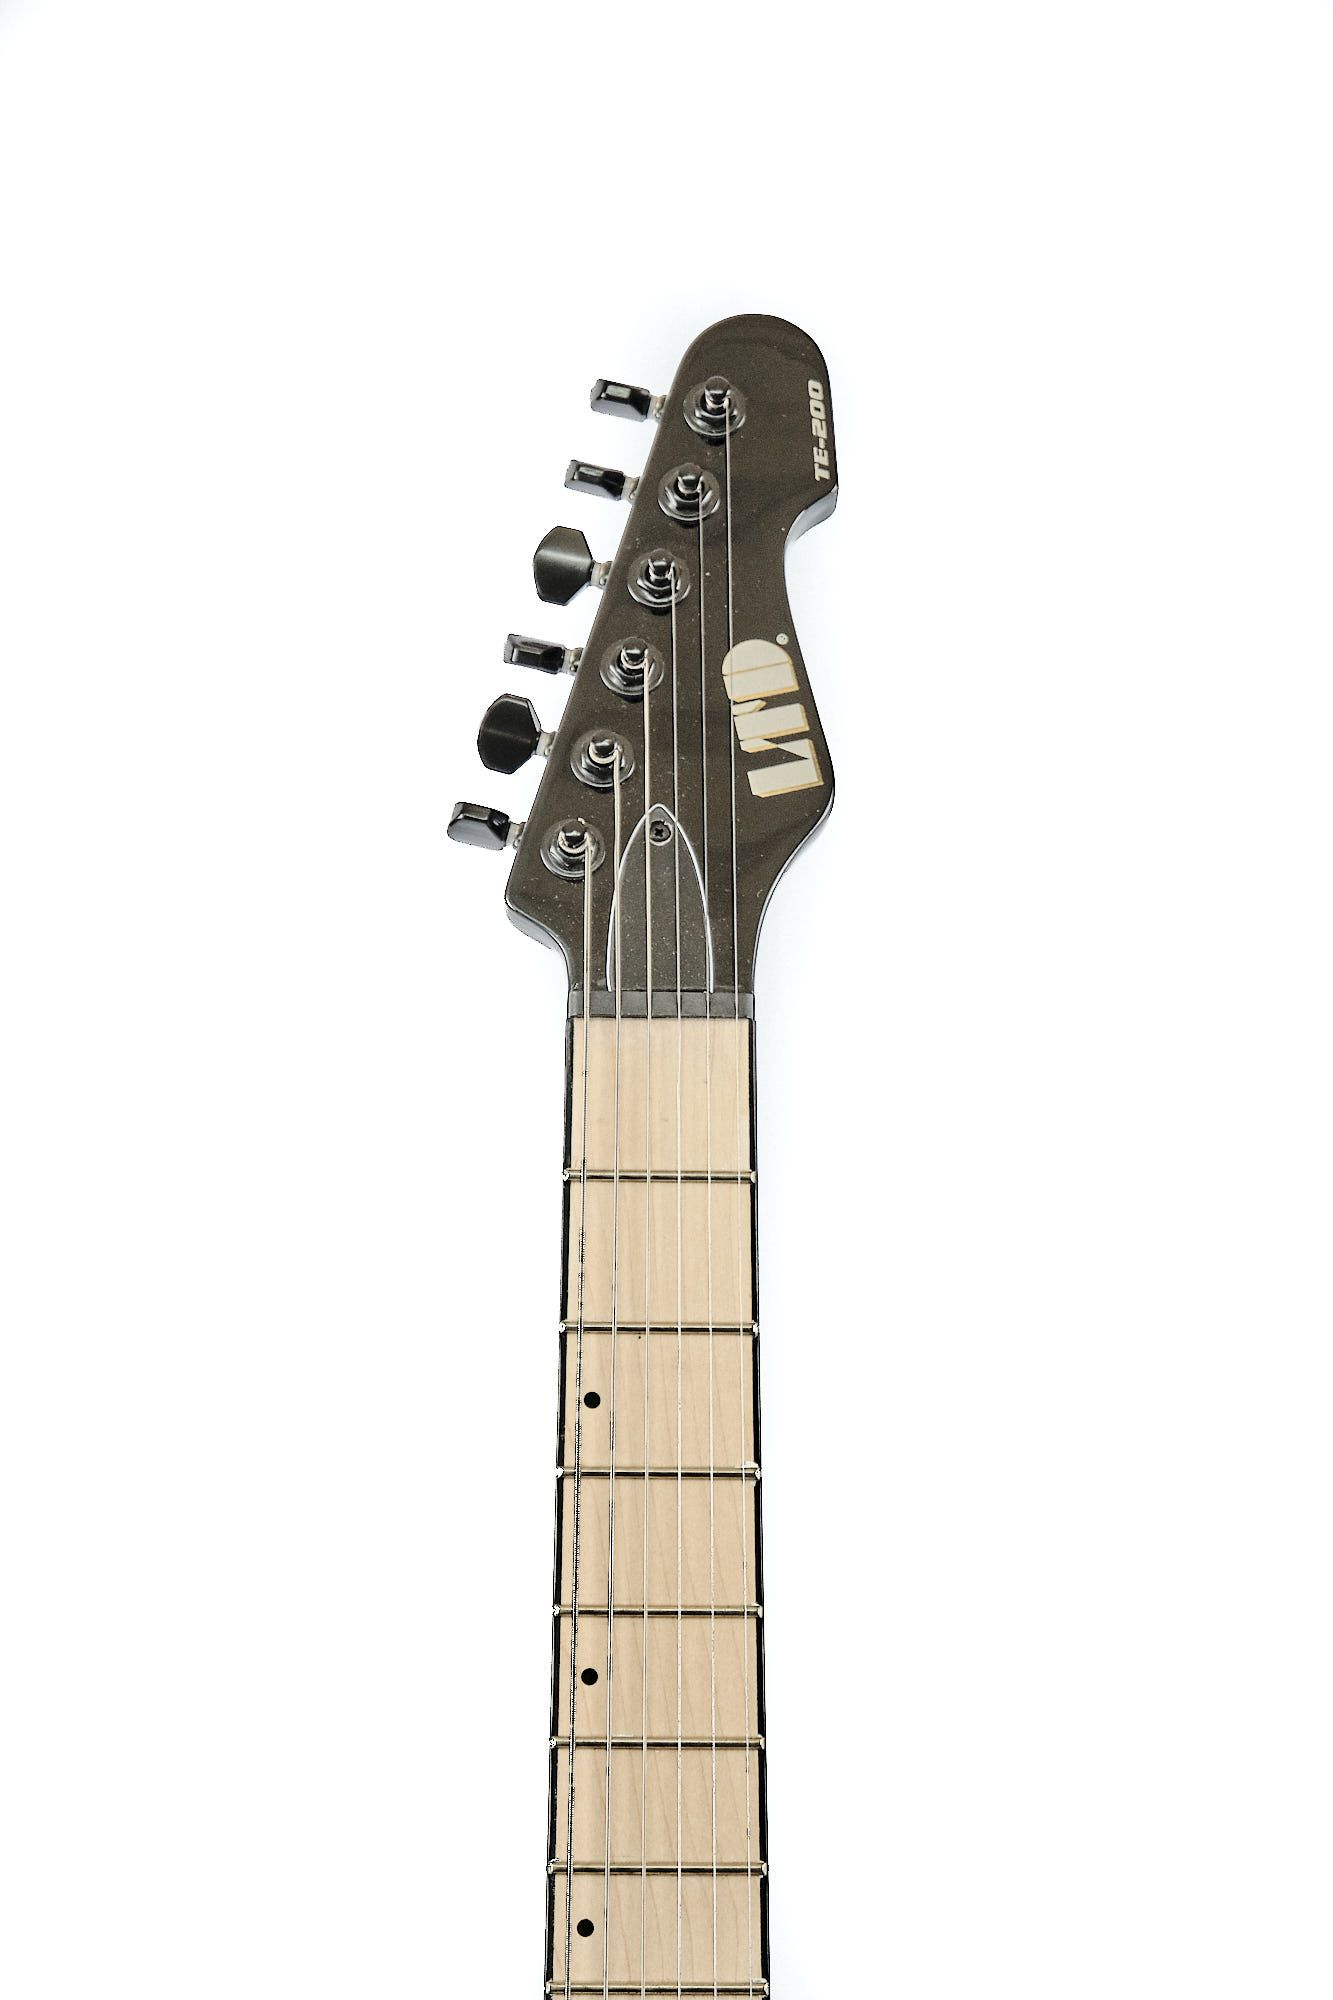 Guitarra Esp Ltd Te200m Telecaster Hh Mogno Black